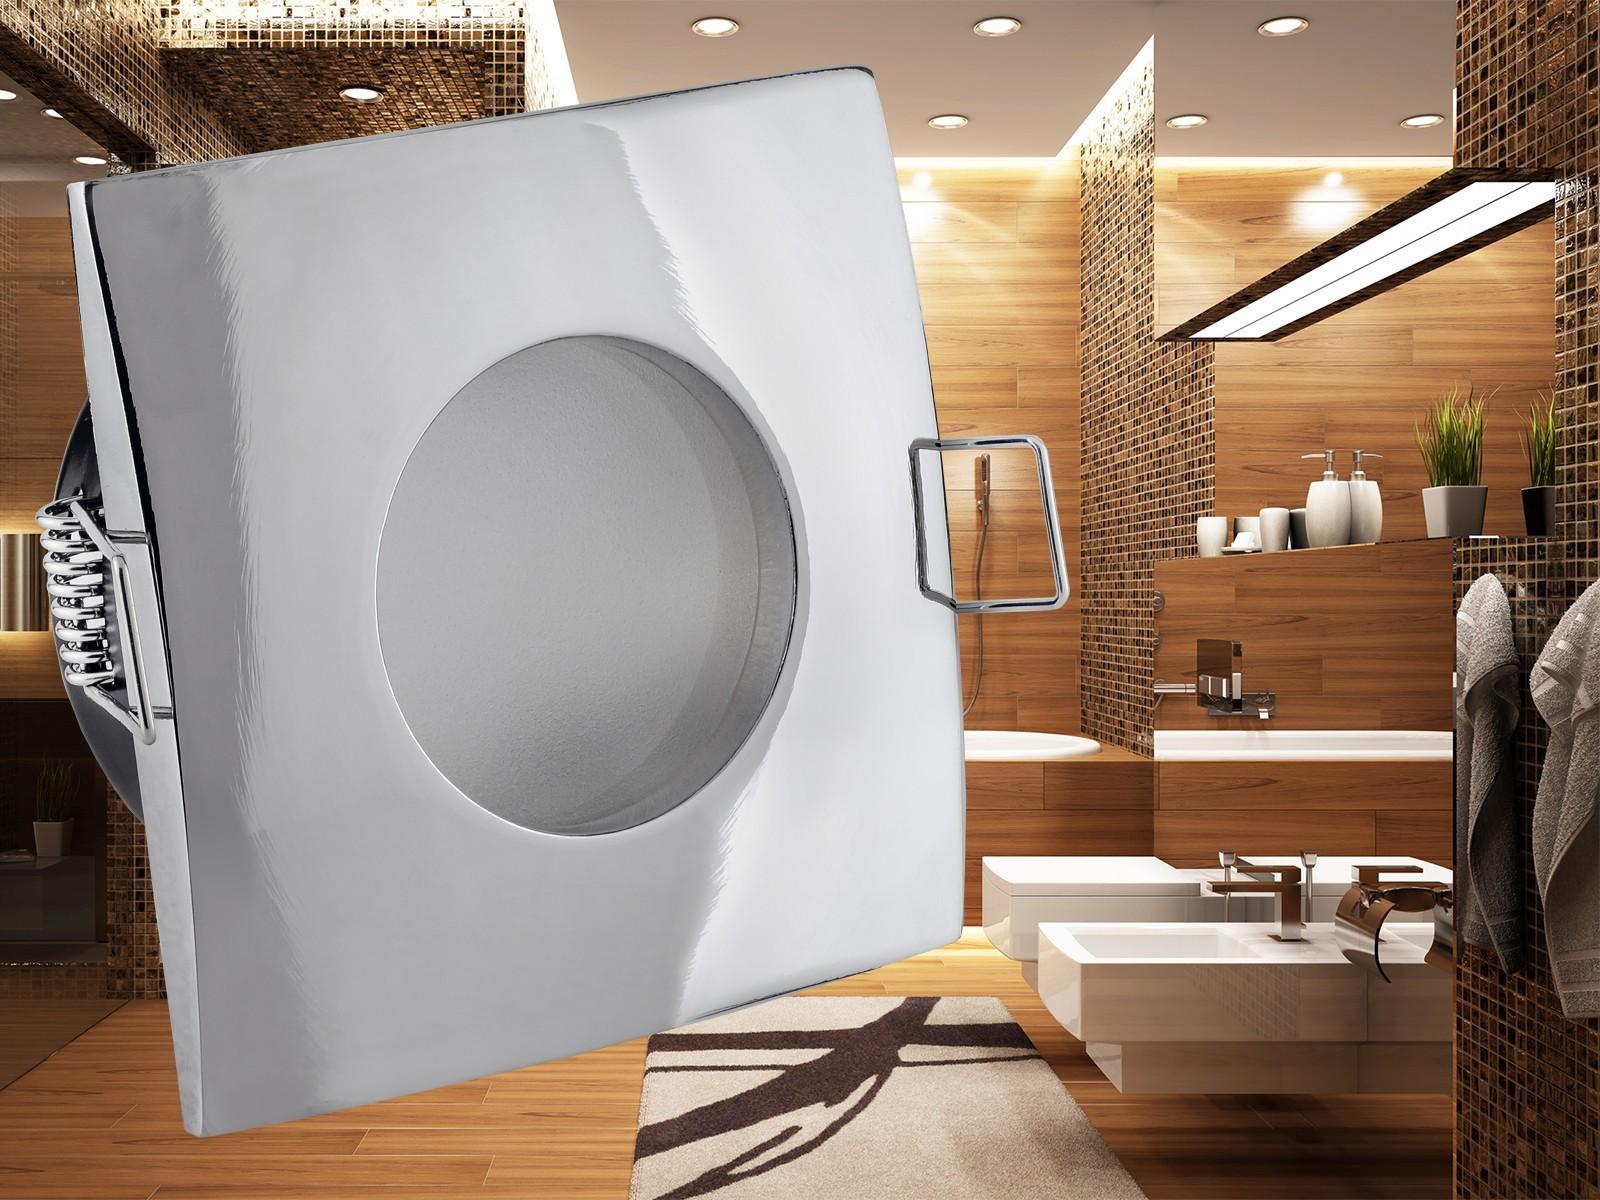 qw 1 feuchtraum led einbaustrahler bad einbauleuchte chrom ip65 3w smd led warm wei gu10. Black Bedroom Furniture Sets. Home Design Ideas